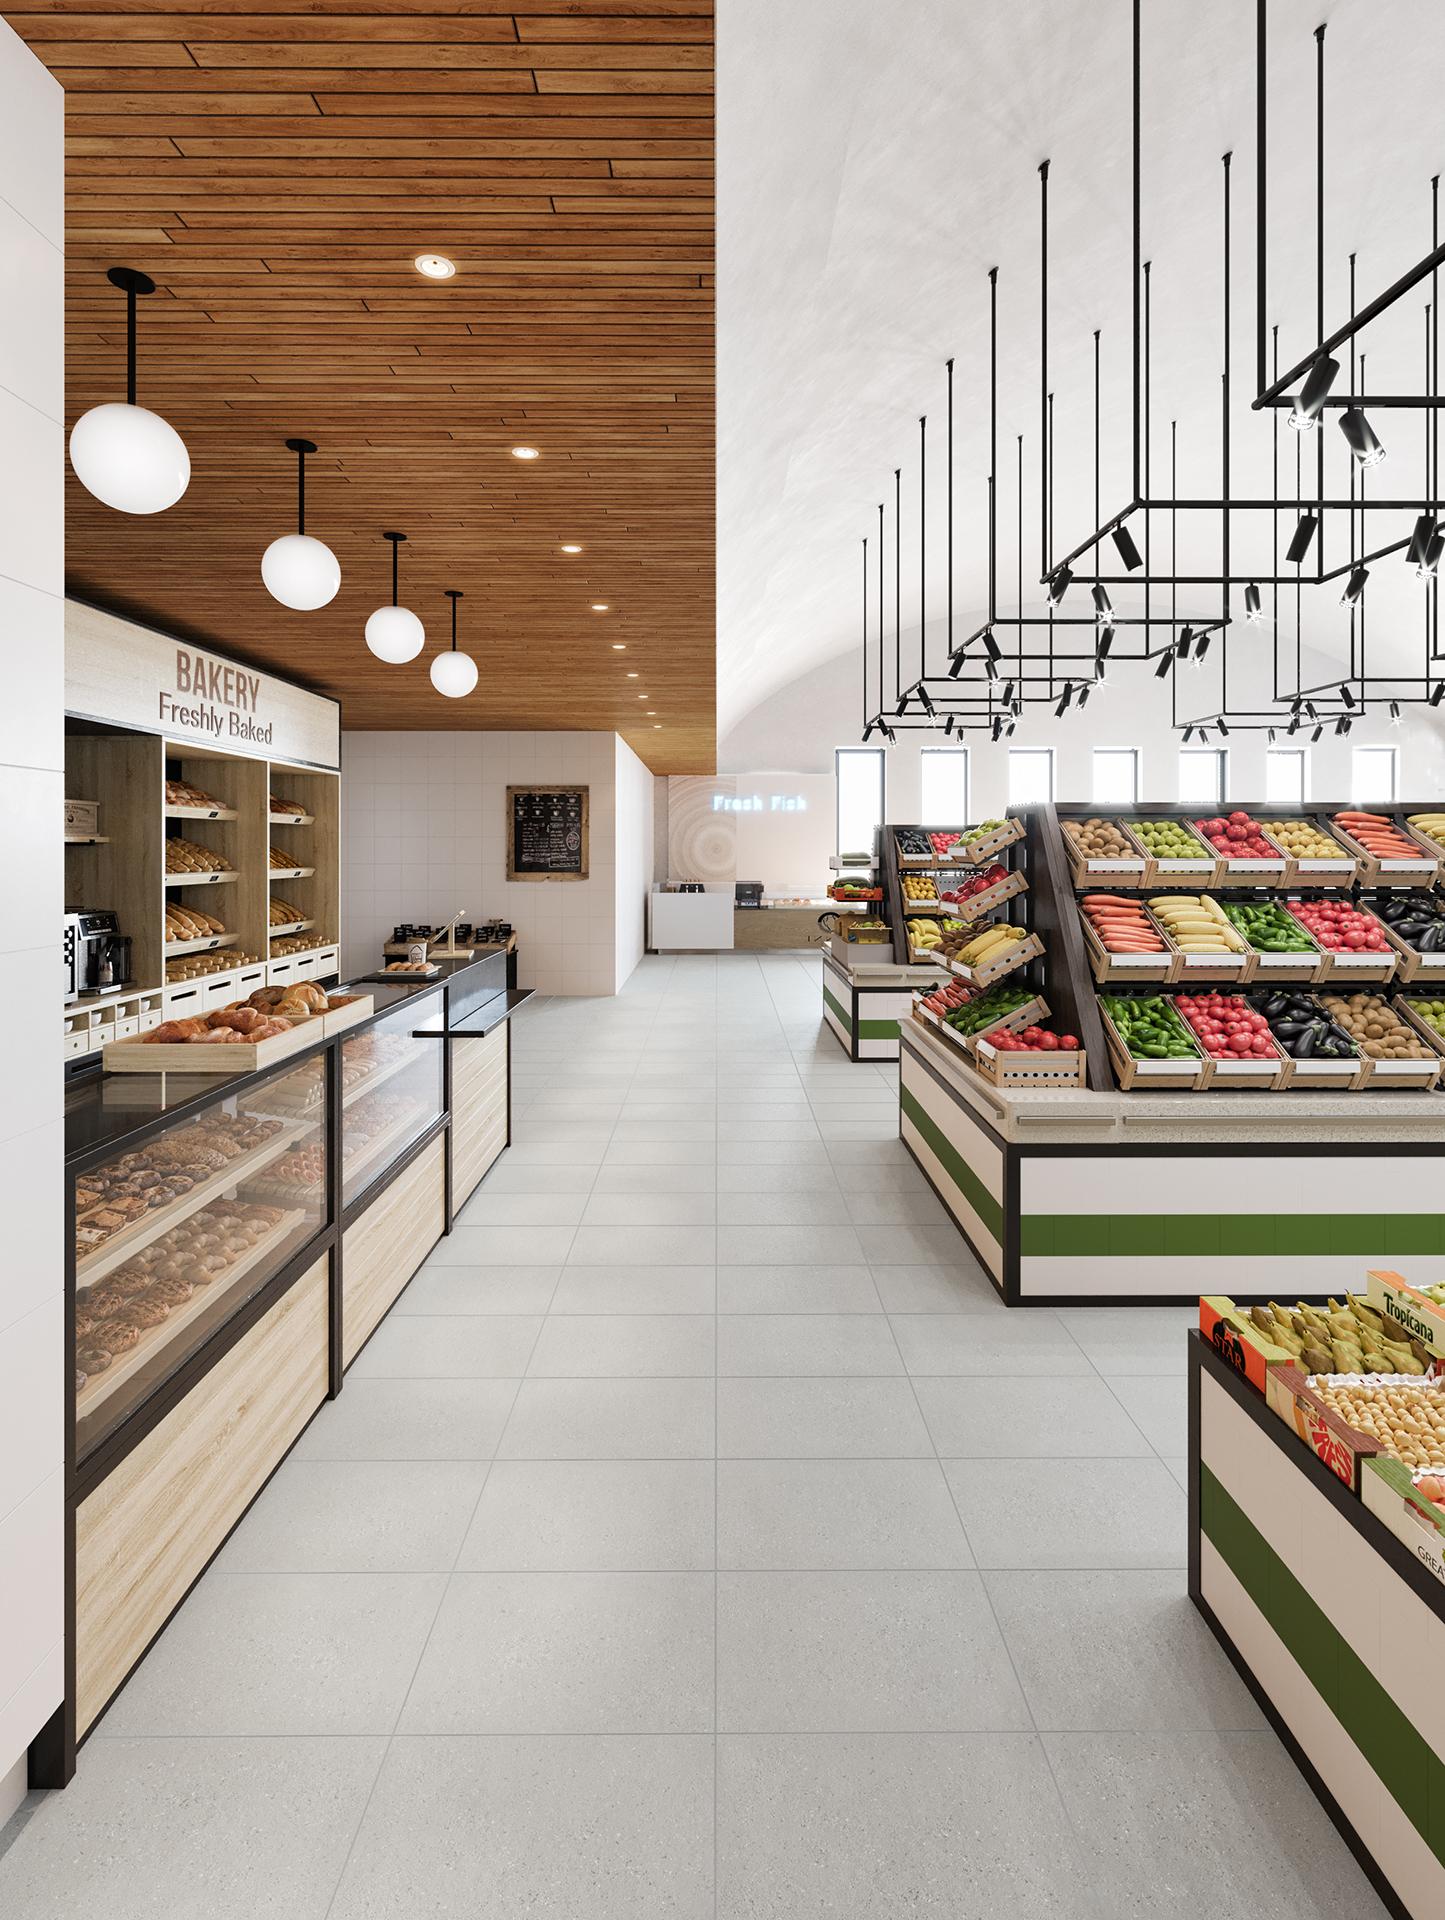 mosa-canvas-3504-supermarket-large-surface